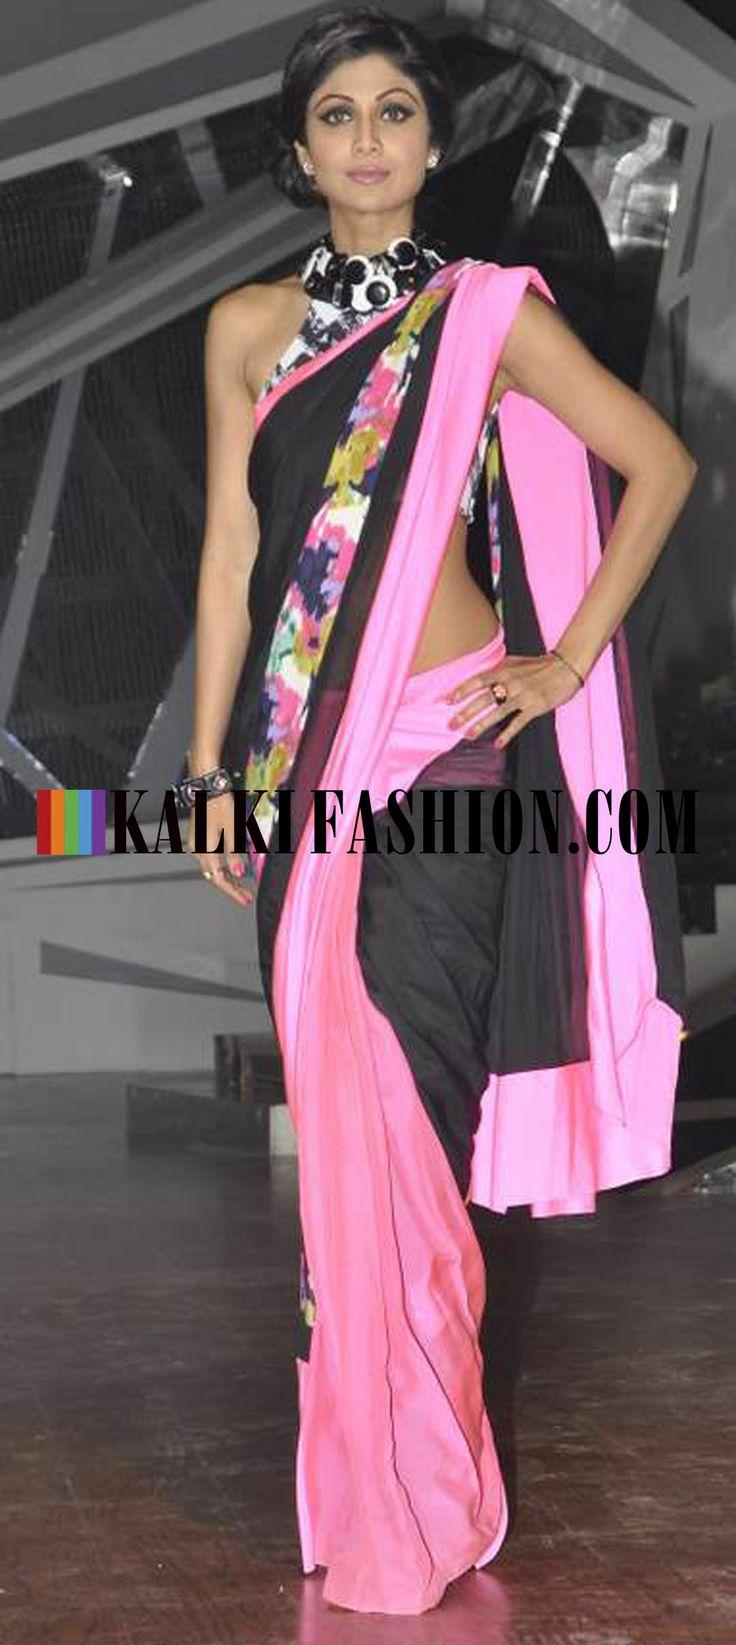 http://www.kalkifashion.com/ Shilpa Shetty shows her fabulous figure  in Shivan and Naresh Saree on the set of Nach Baliye.